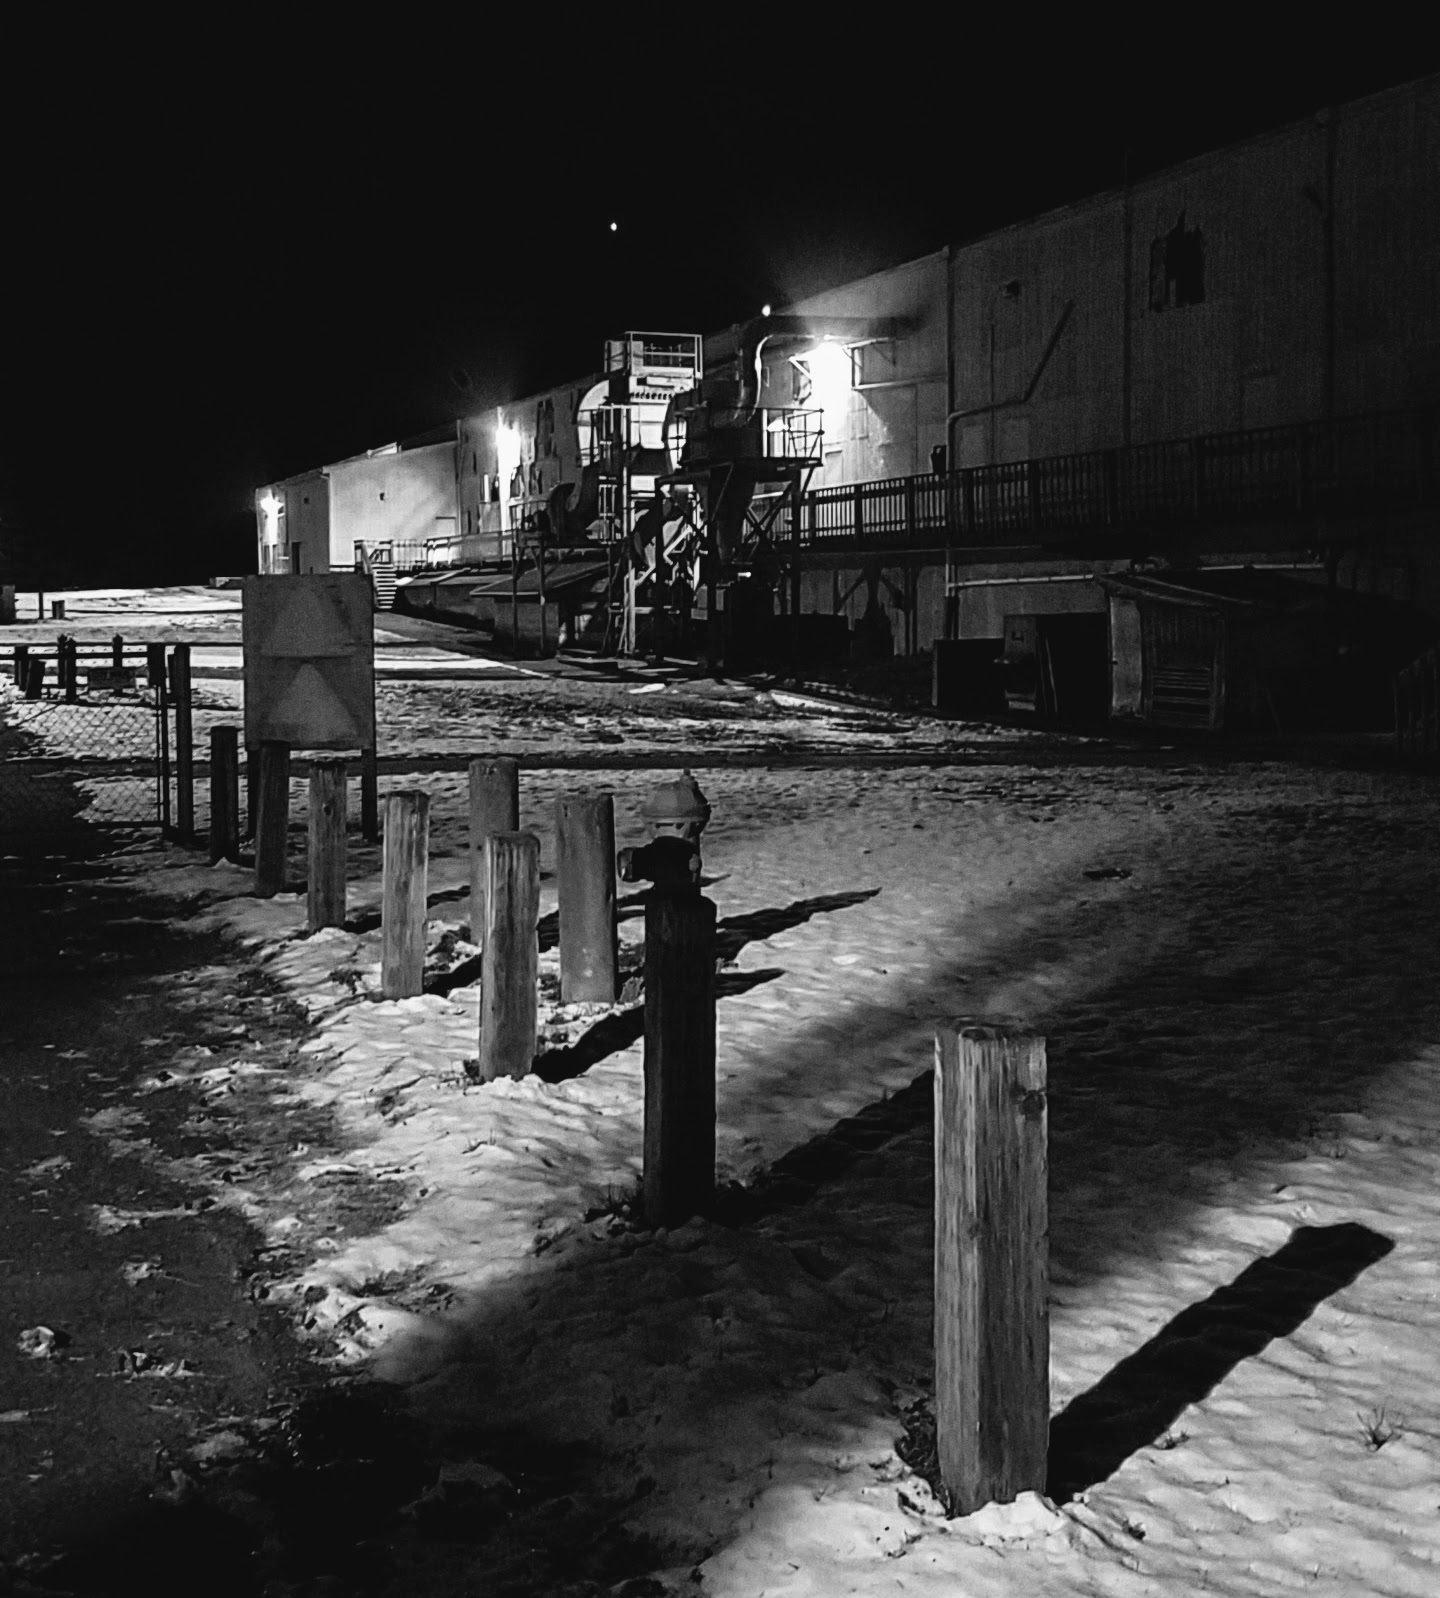 Old K2 Factory